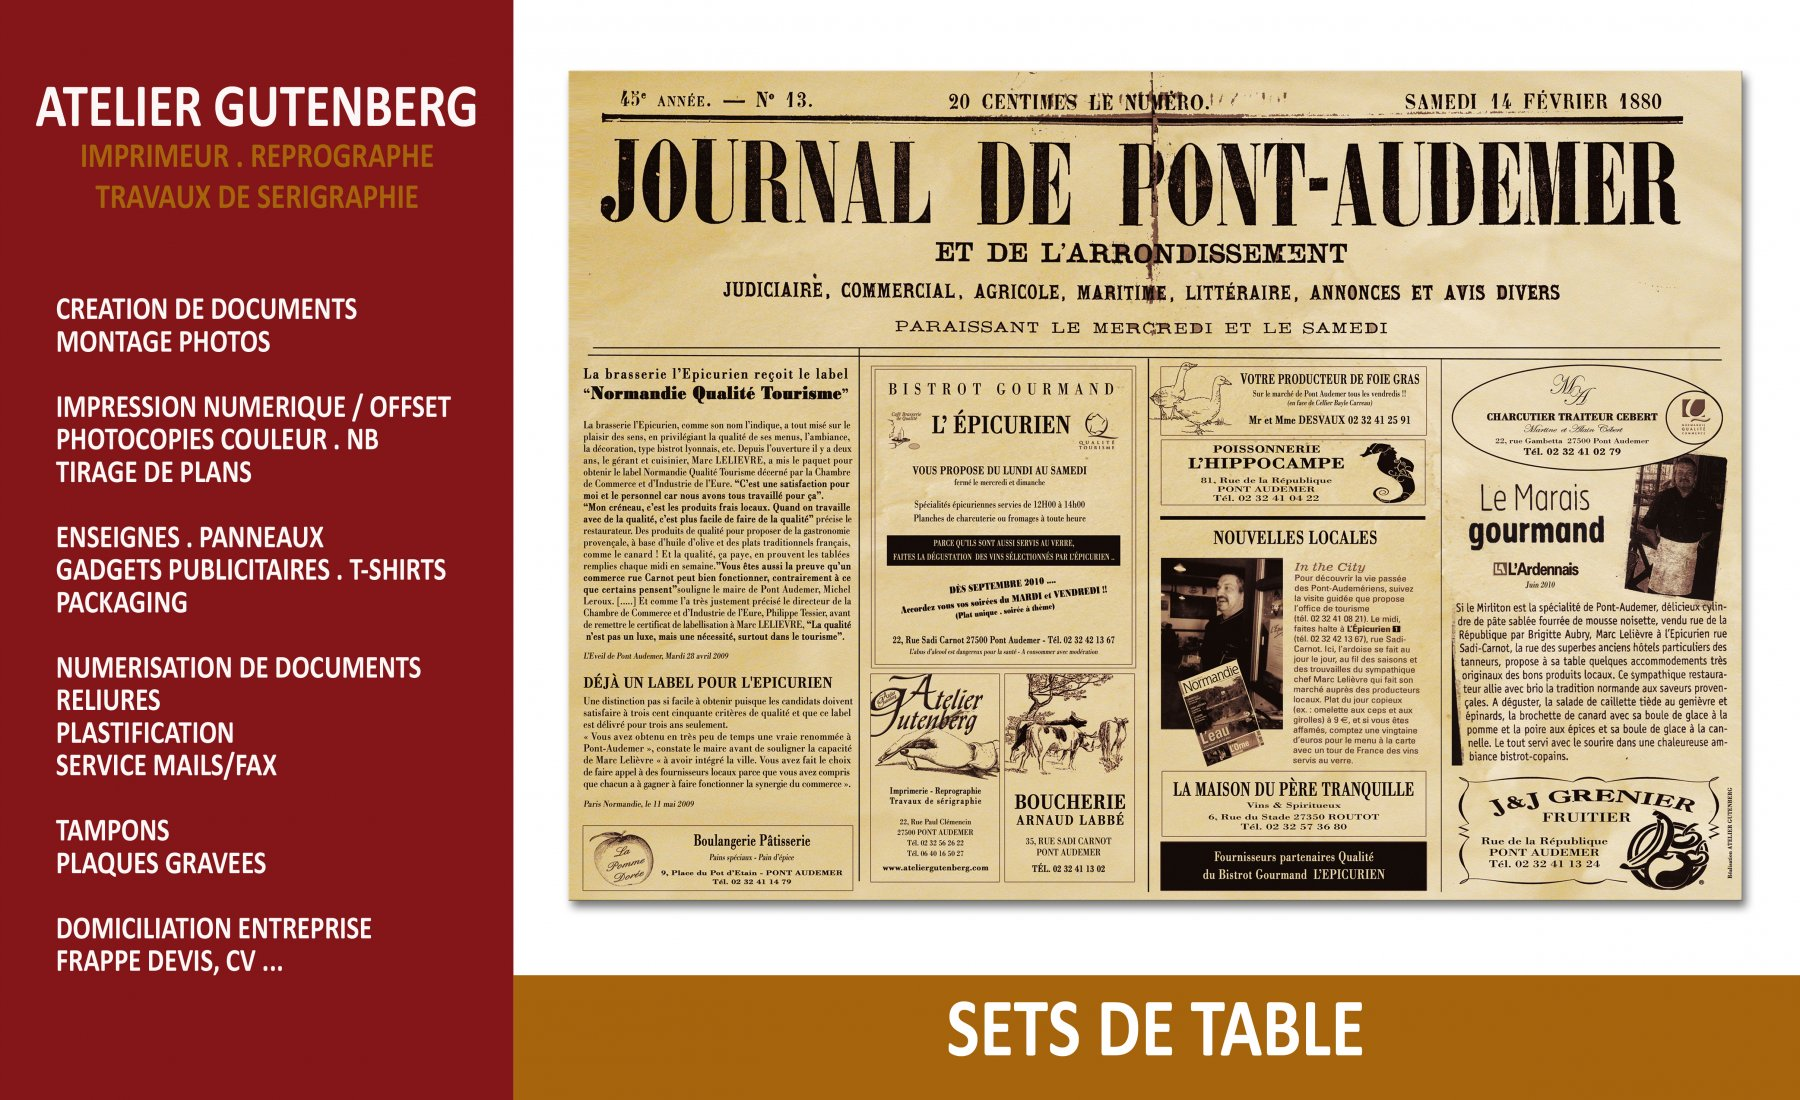 atelier gutenberg set de table